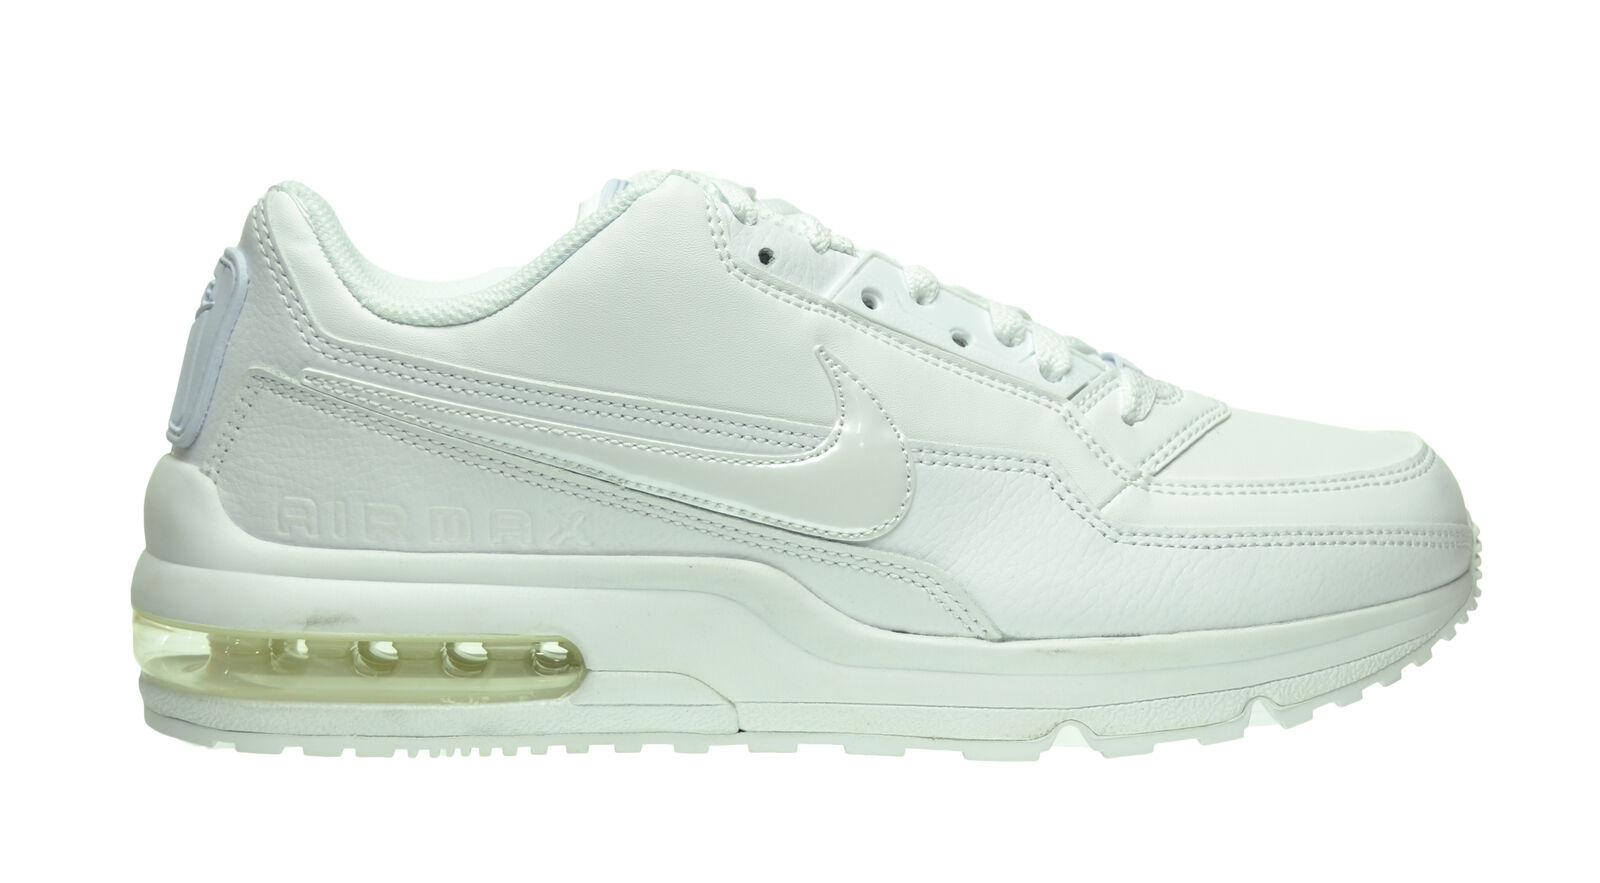 new styles 3ba0f b5cf2 ... new arrivals nike air max ltd 3 hommes blanc chaussures blanc blanc  blanc hommes 687977 111